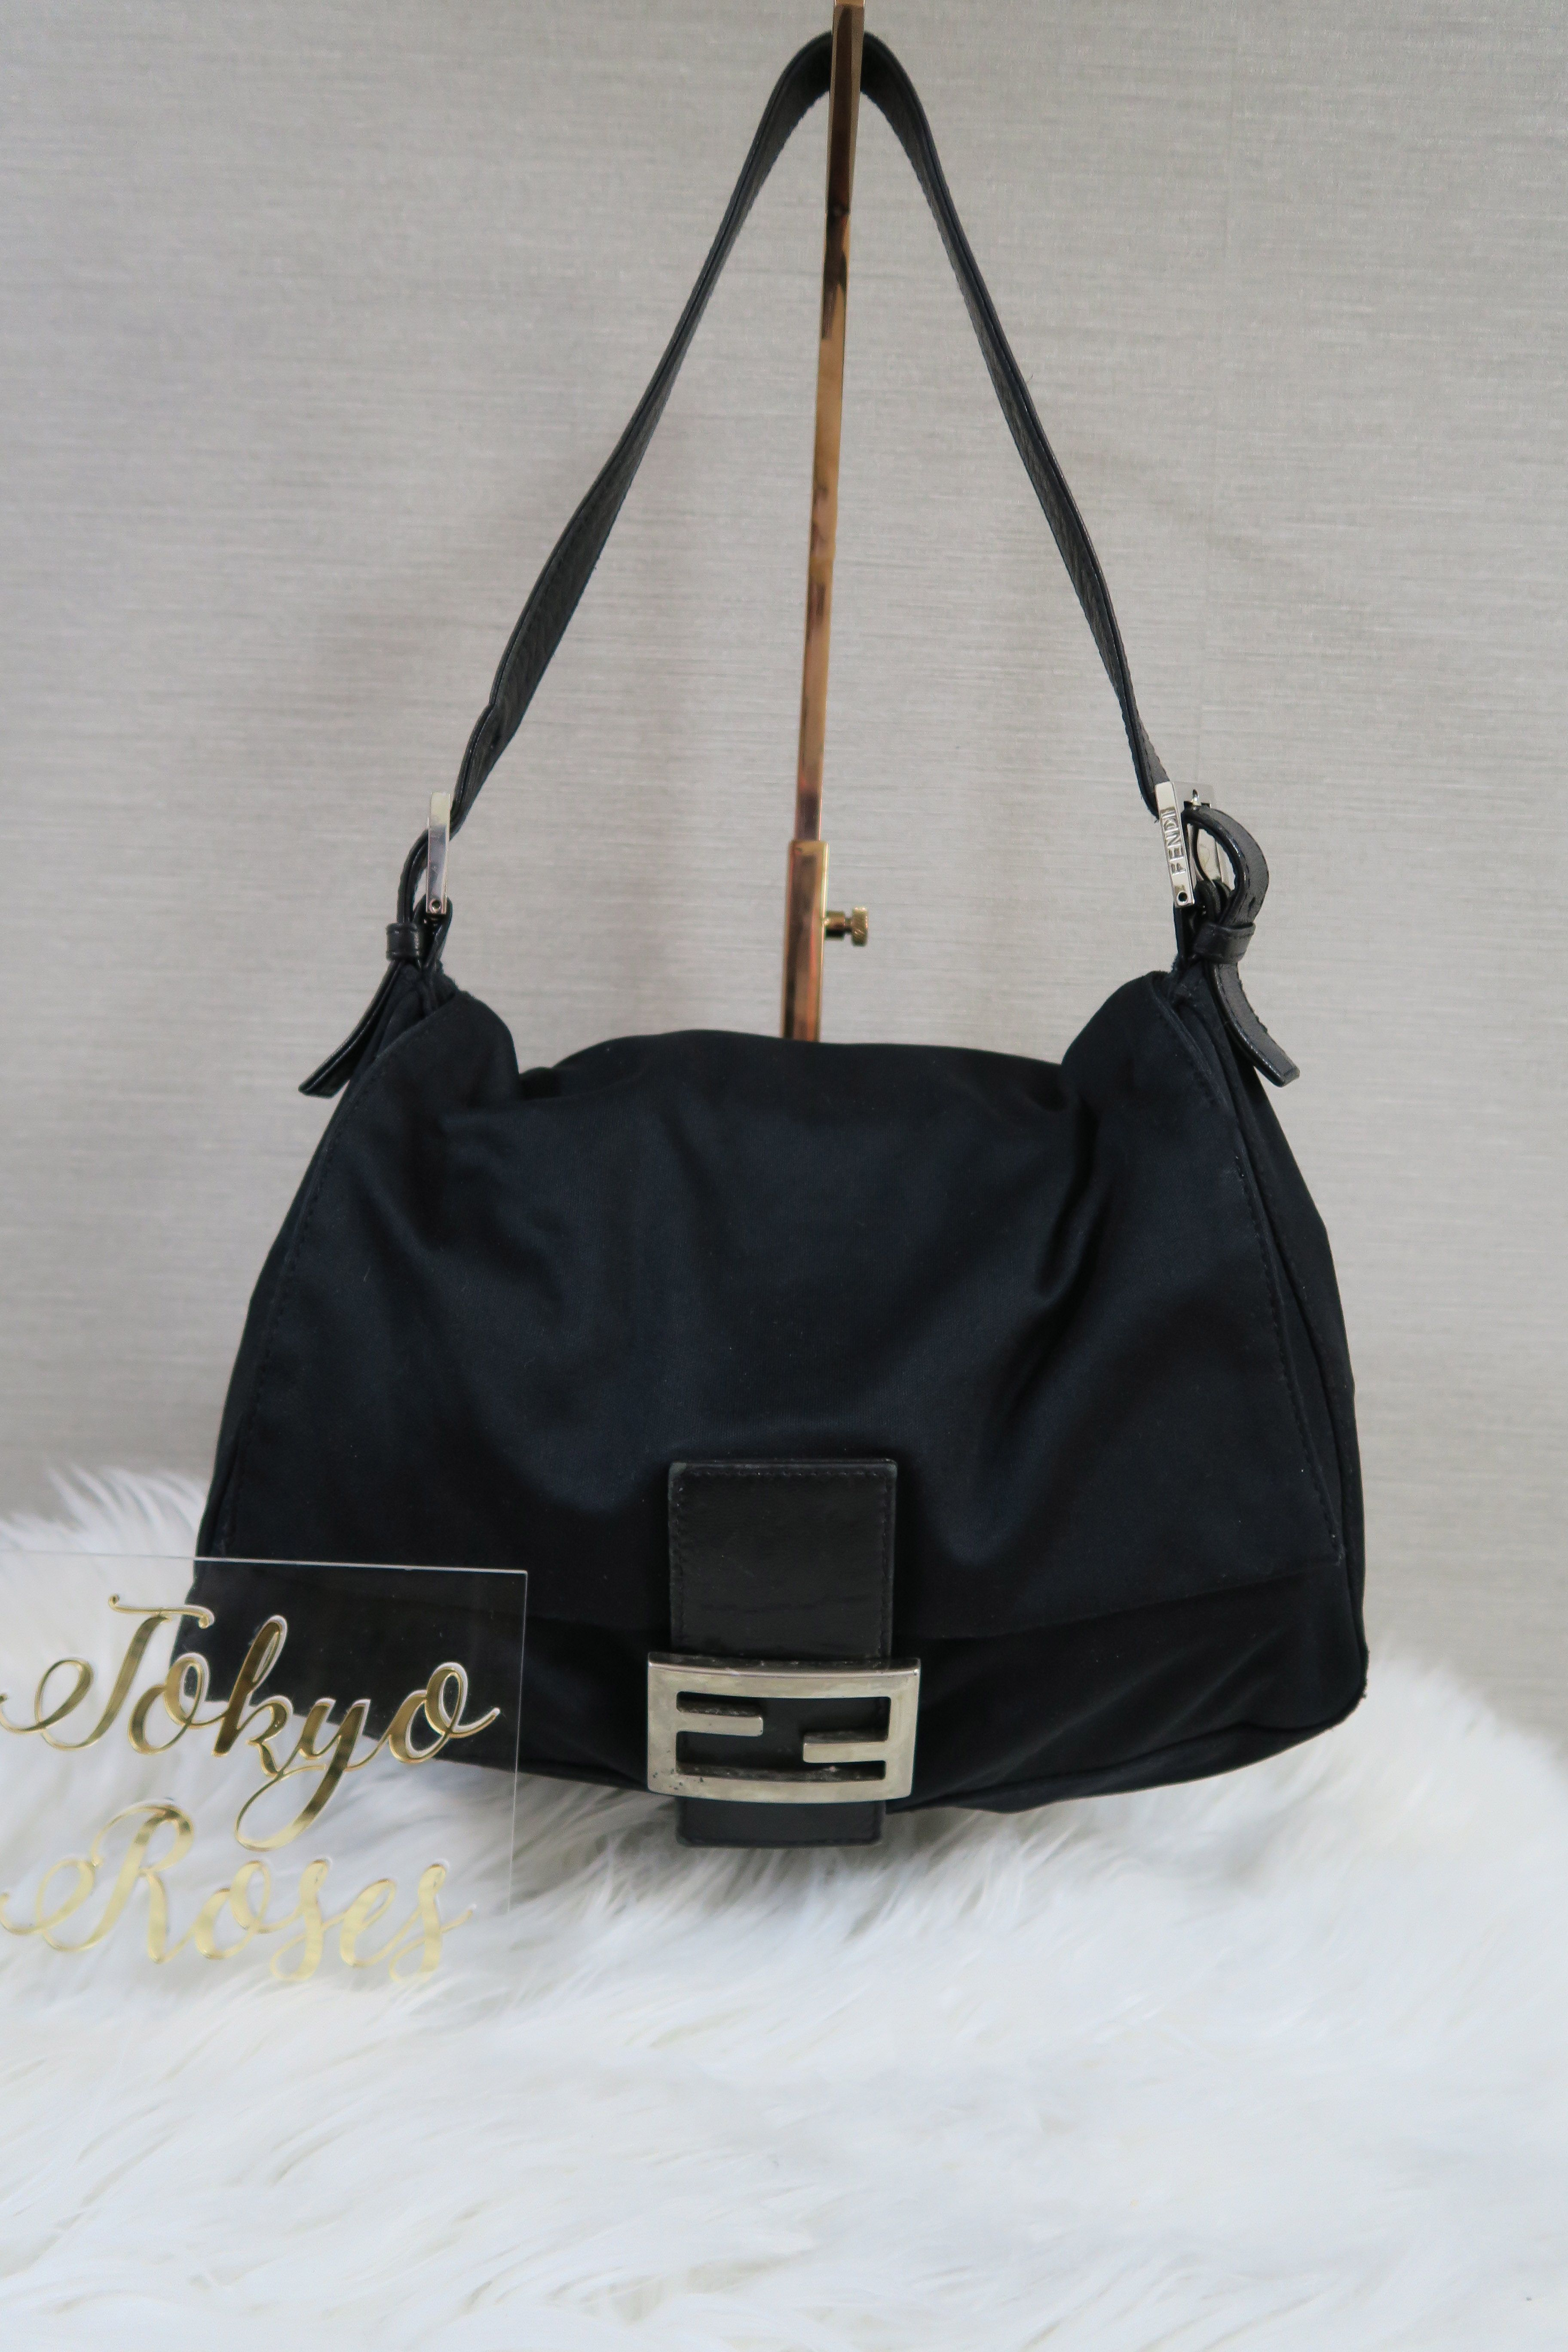 fdd4896ded05 Black Fendi Mama Baguette Handbag L in 2019